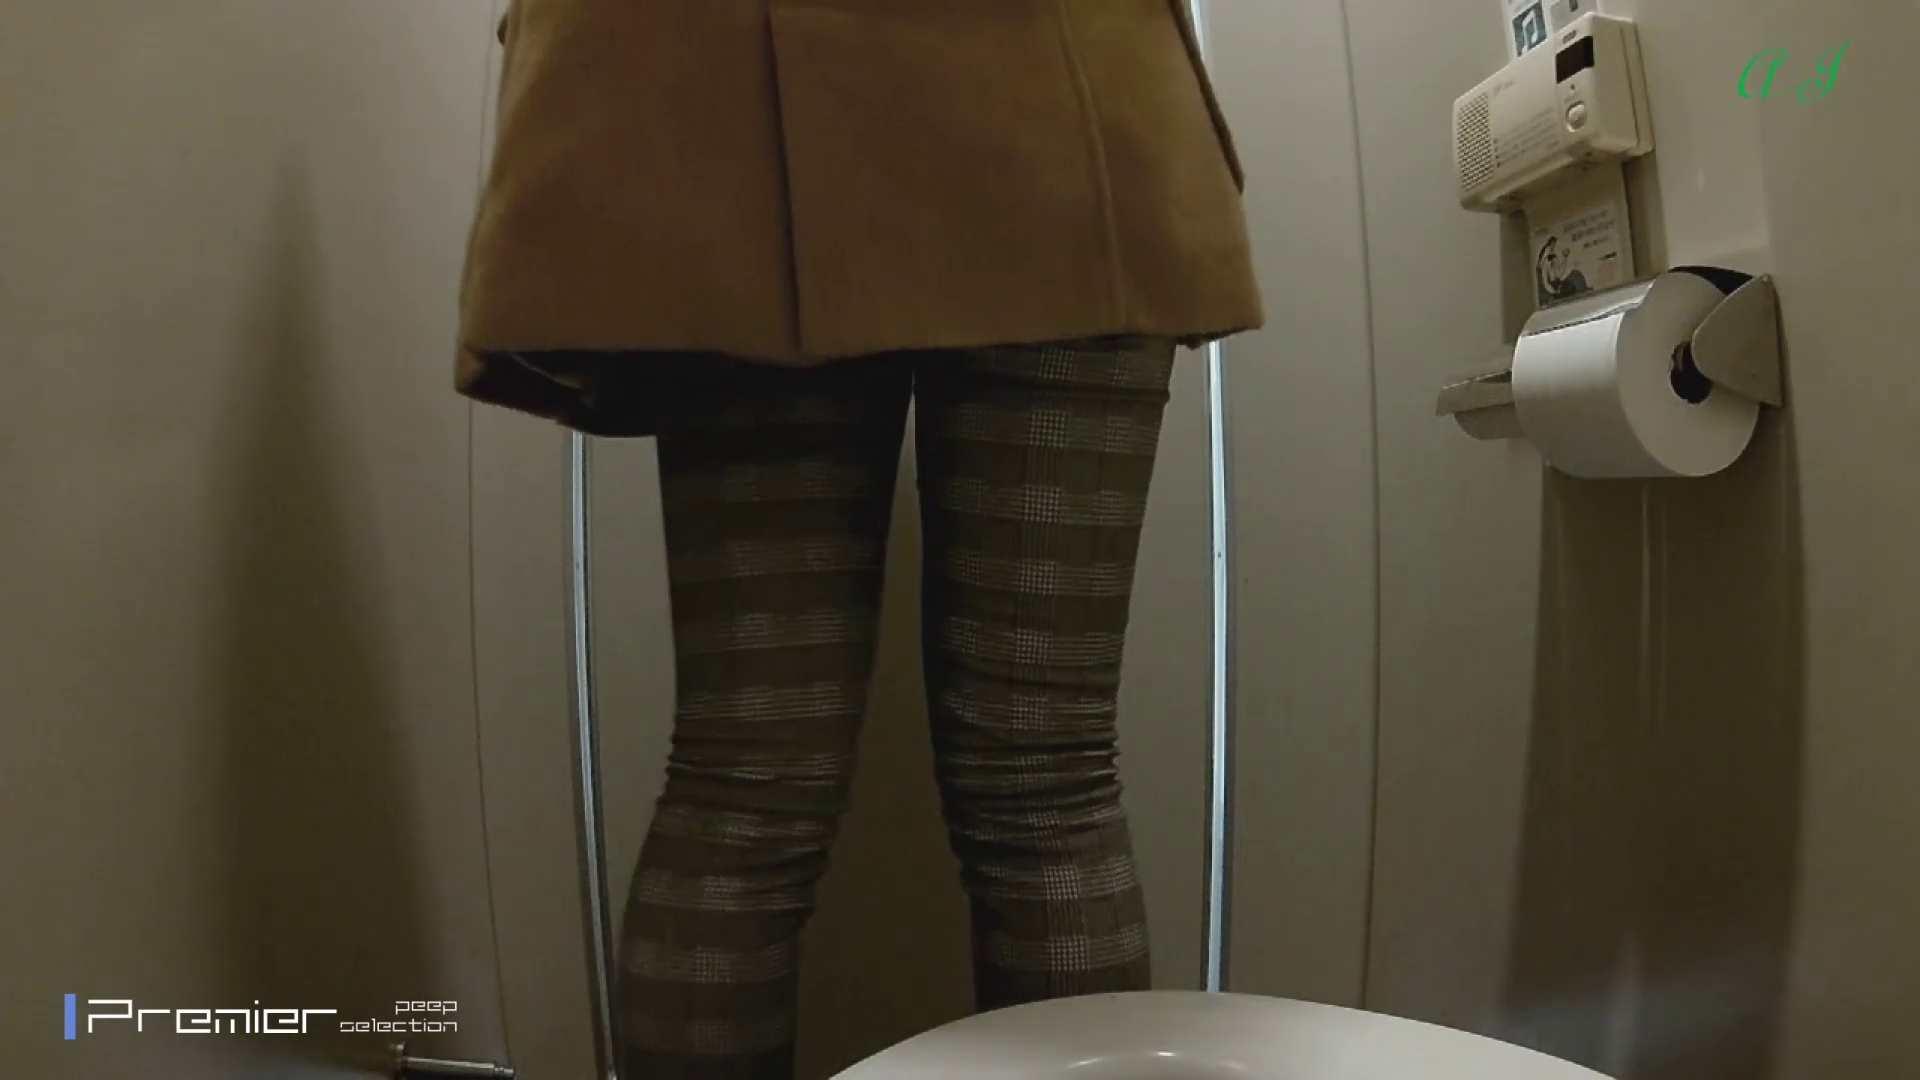 大あり美JDトイレ盗撮【有名大学女性洗面所 vol.80】 高画質  113PIX 35